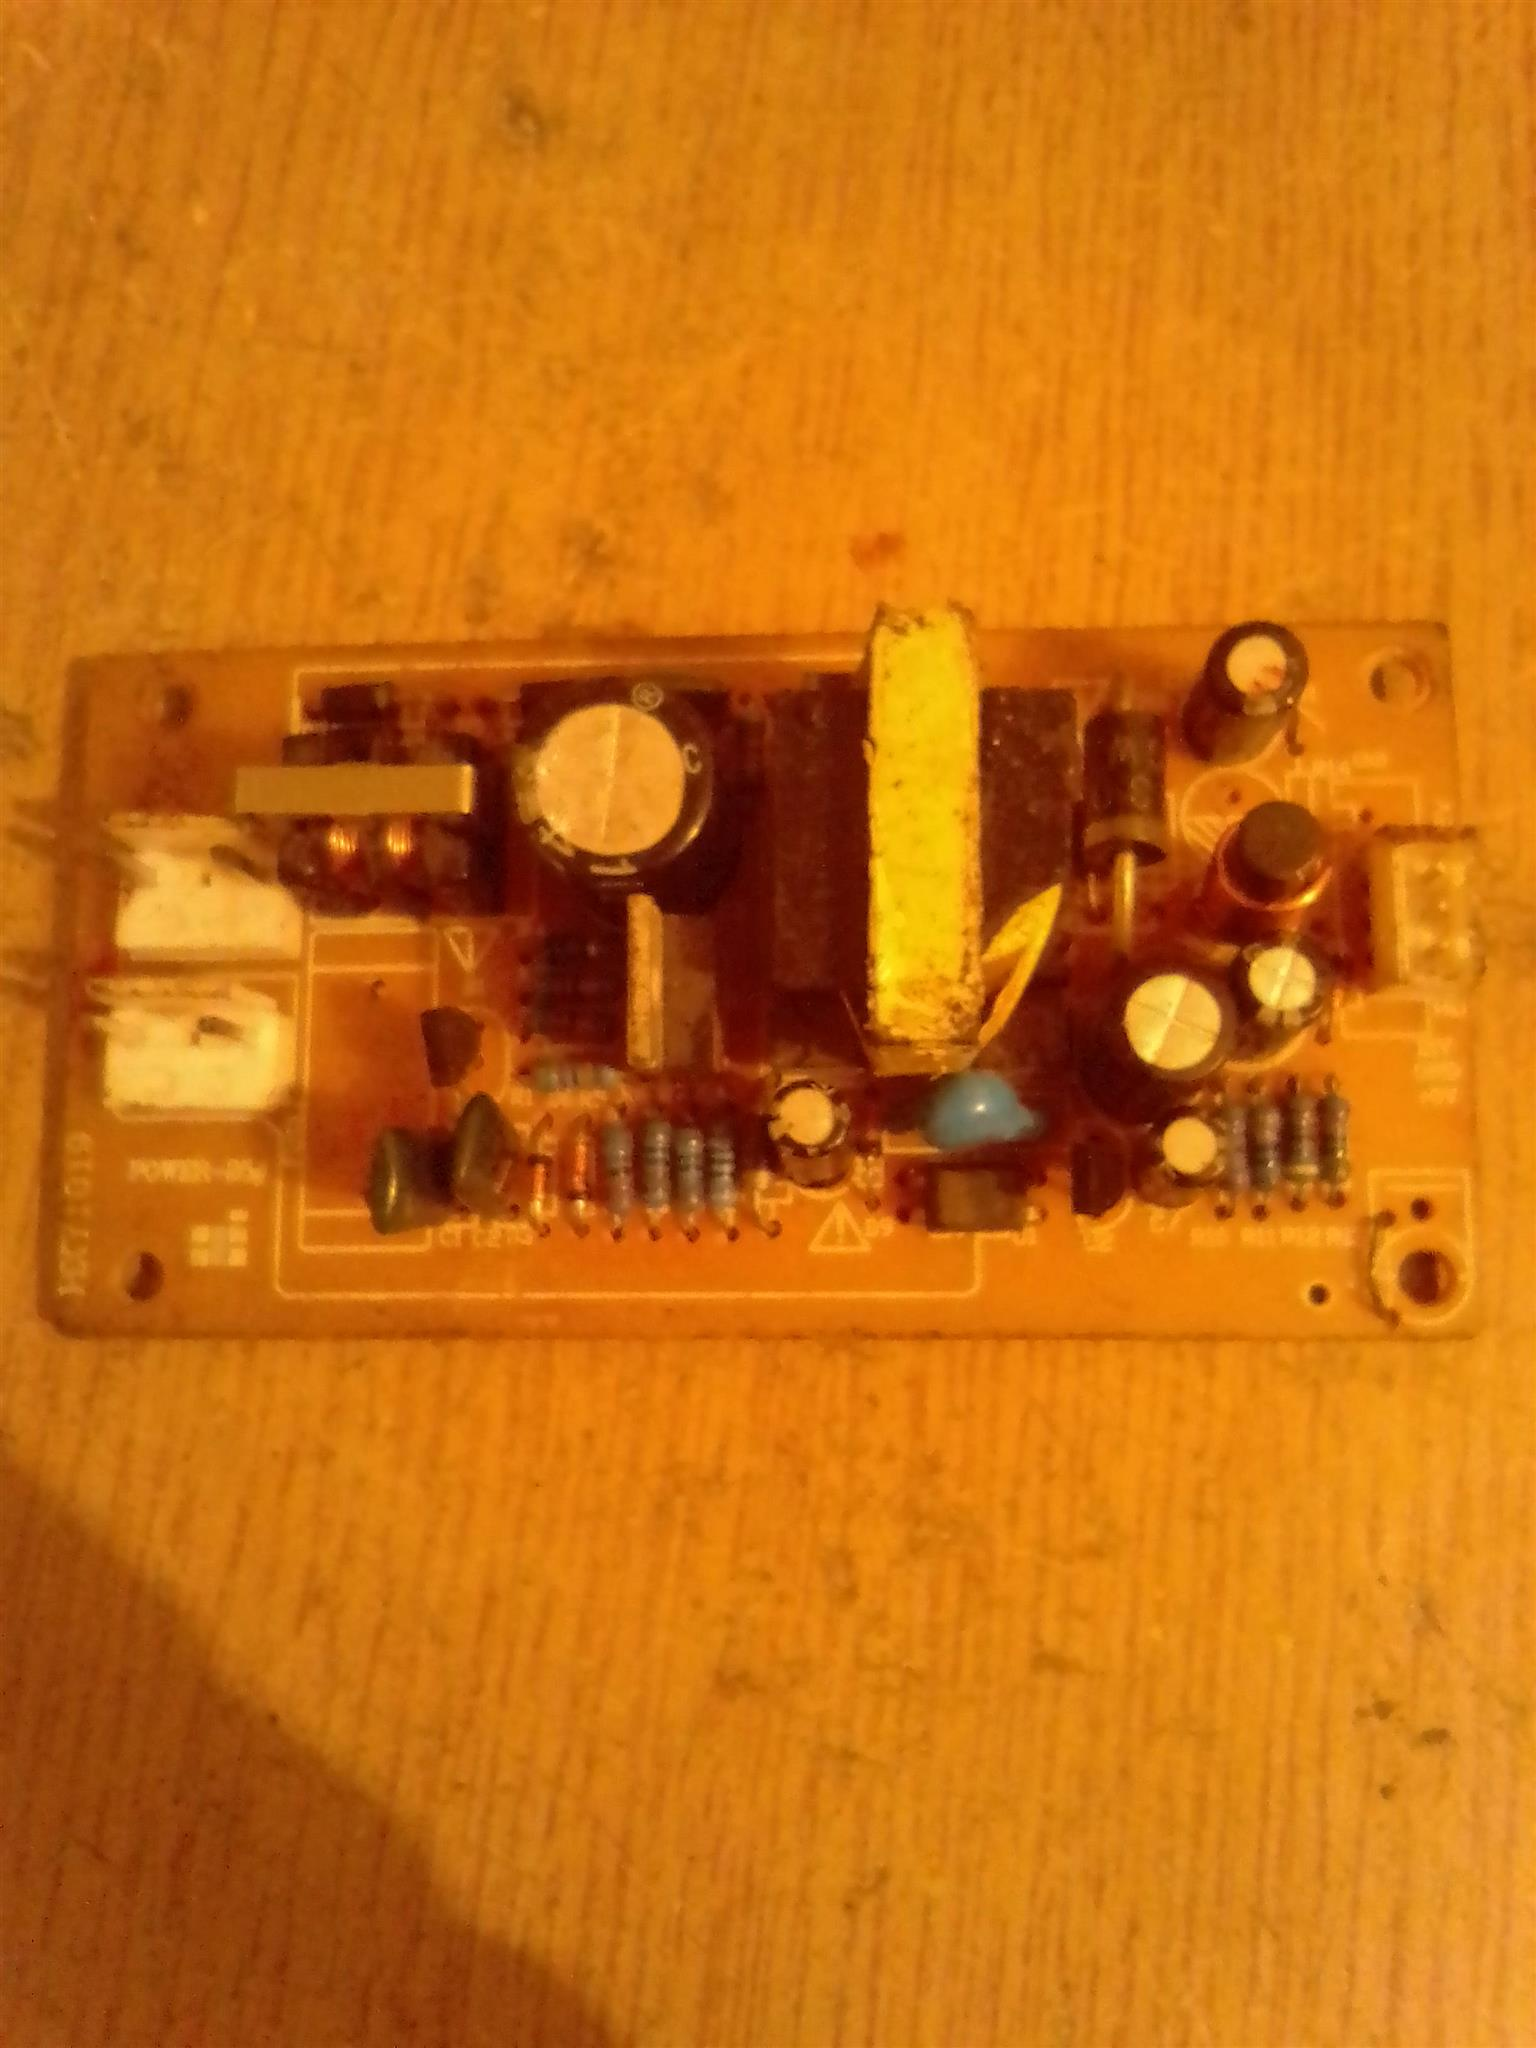 An HXY1019 DVD player power supply board.